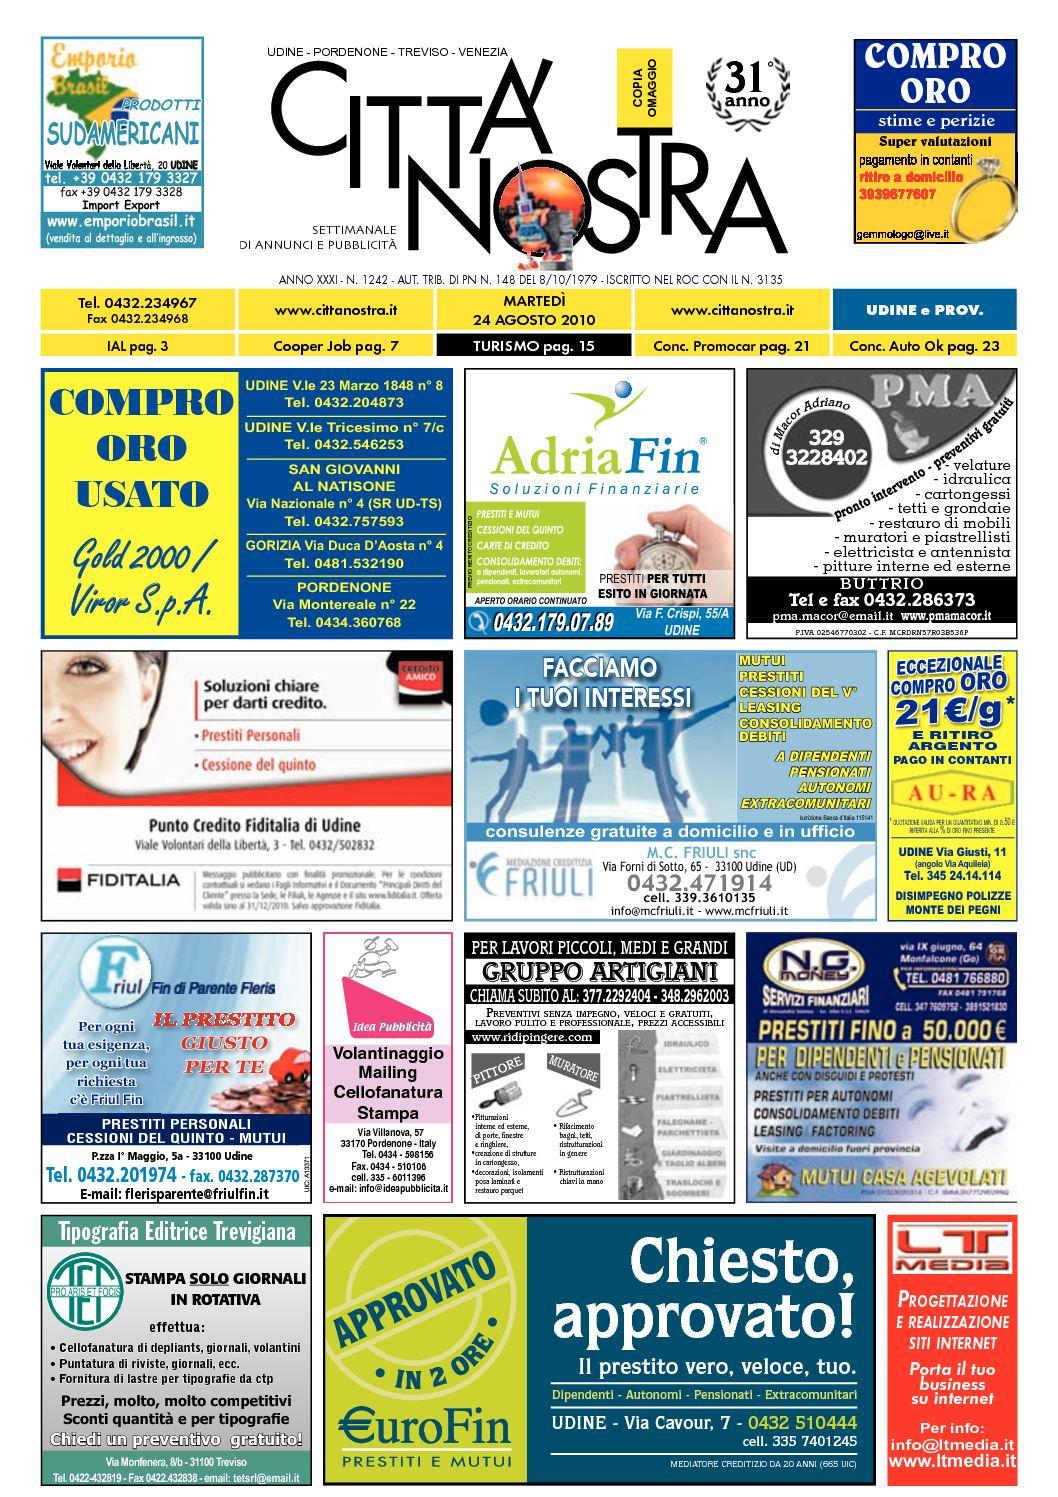 Calaméo Citt Nostra Udine Del 24 08 2010 N 1242